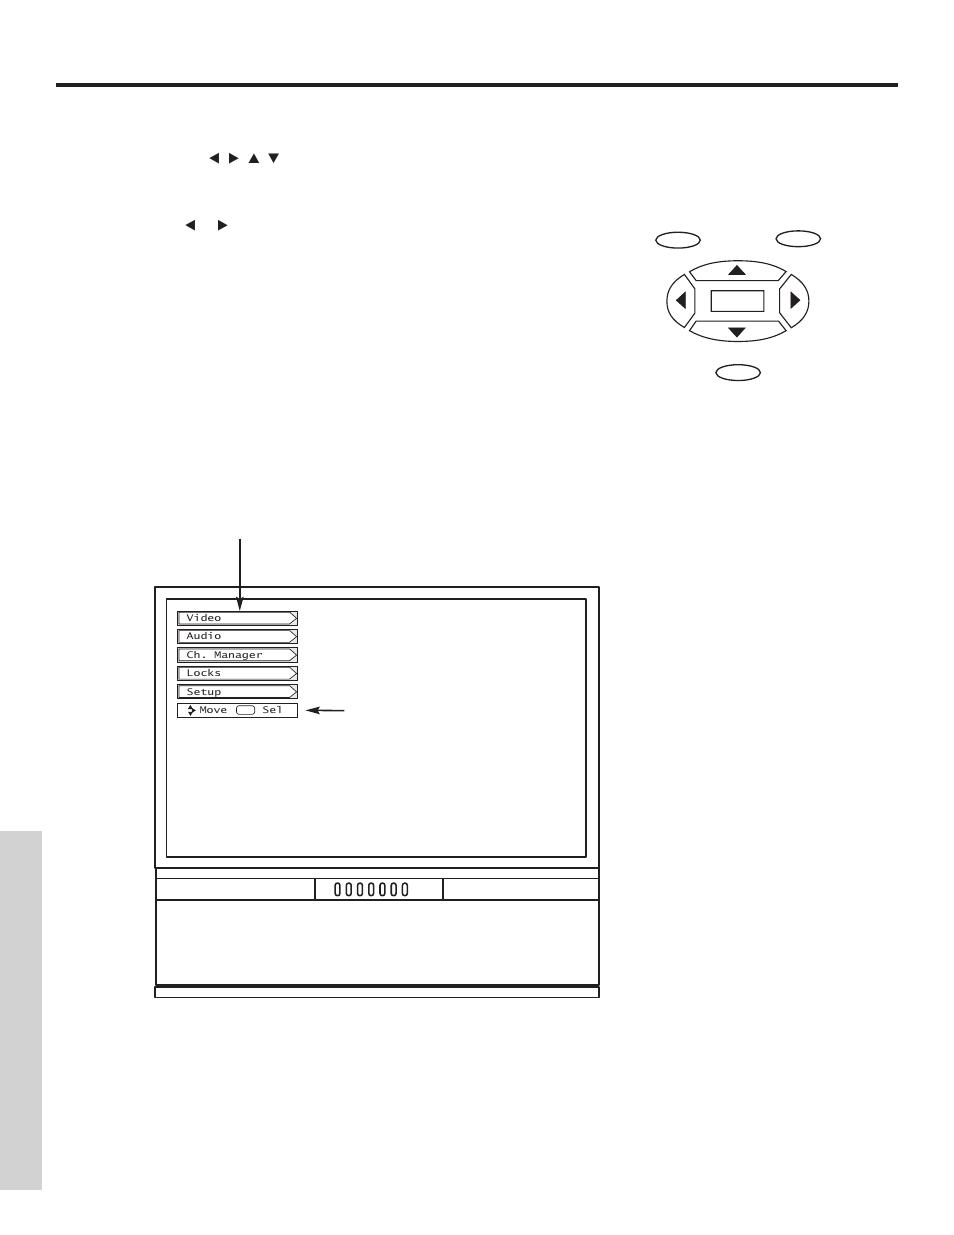 on screen display osd on screen displa y hitachi 51f500 user rh manualsdir com Hitachi StarBoard Manual Hitachi TV Repair Manual